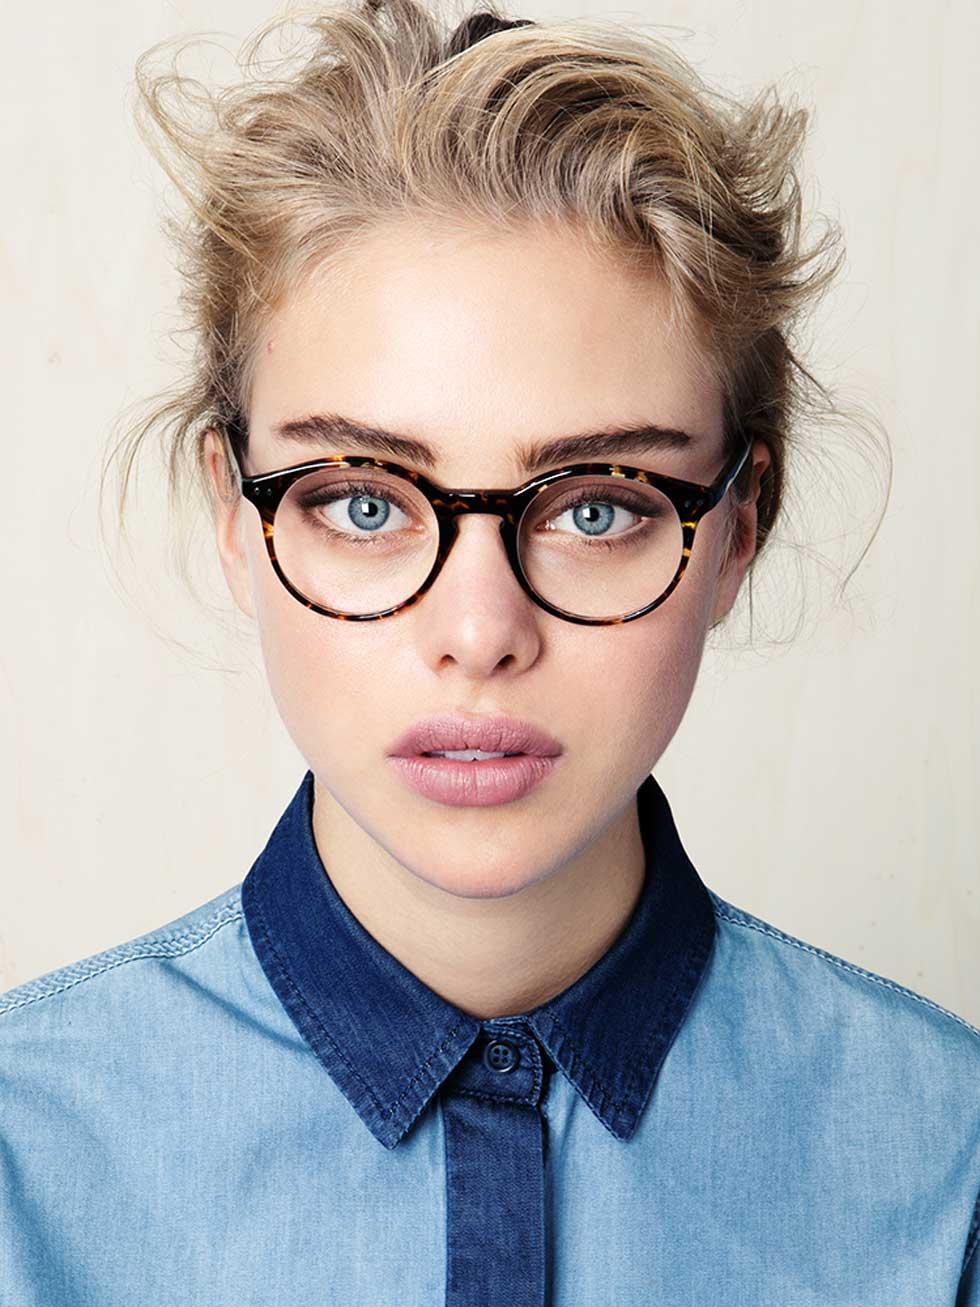 ace-and-tate-ace&tate-eyewear-glasses